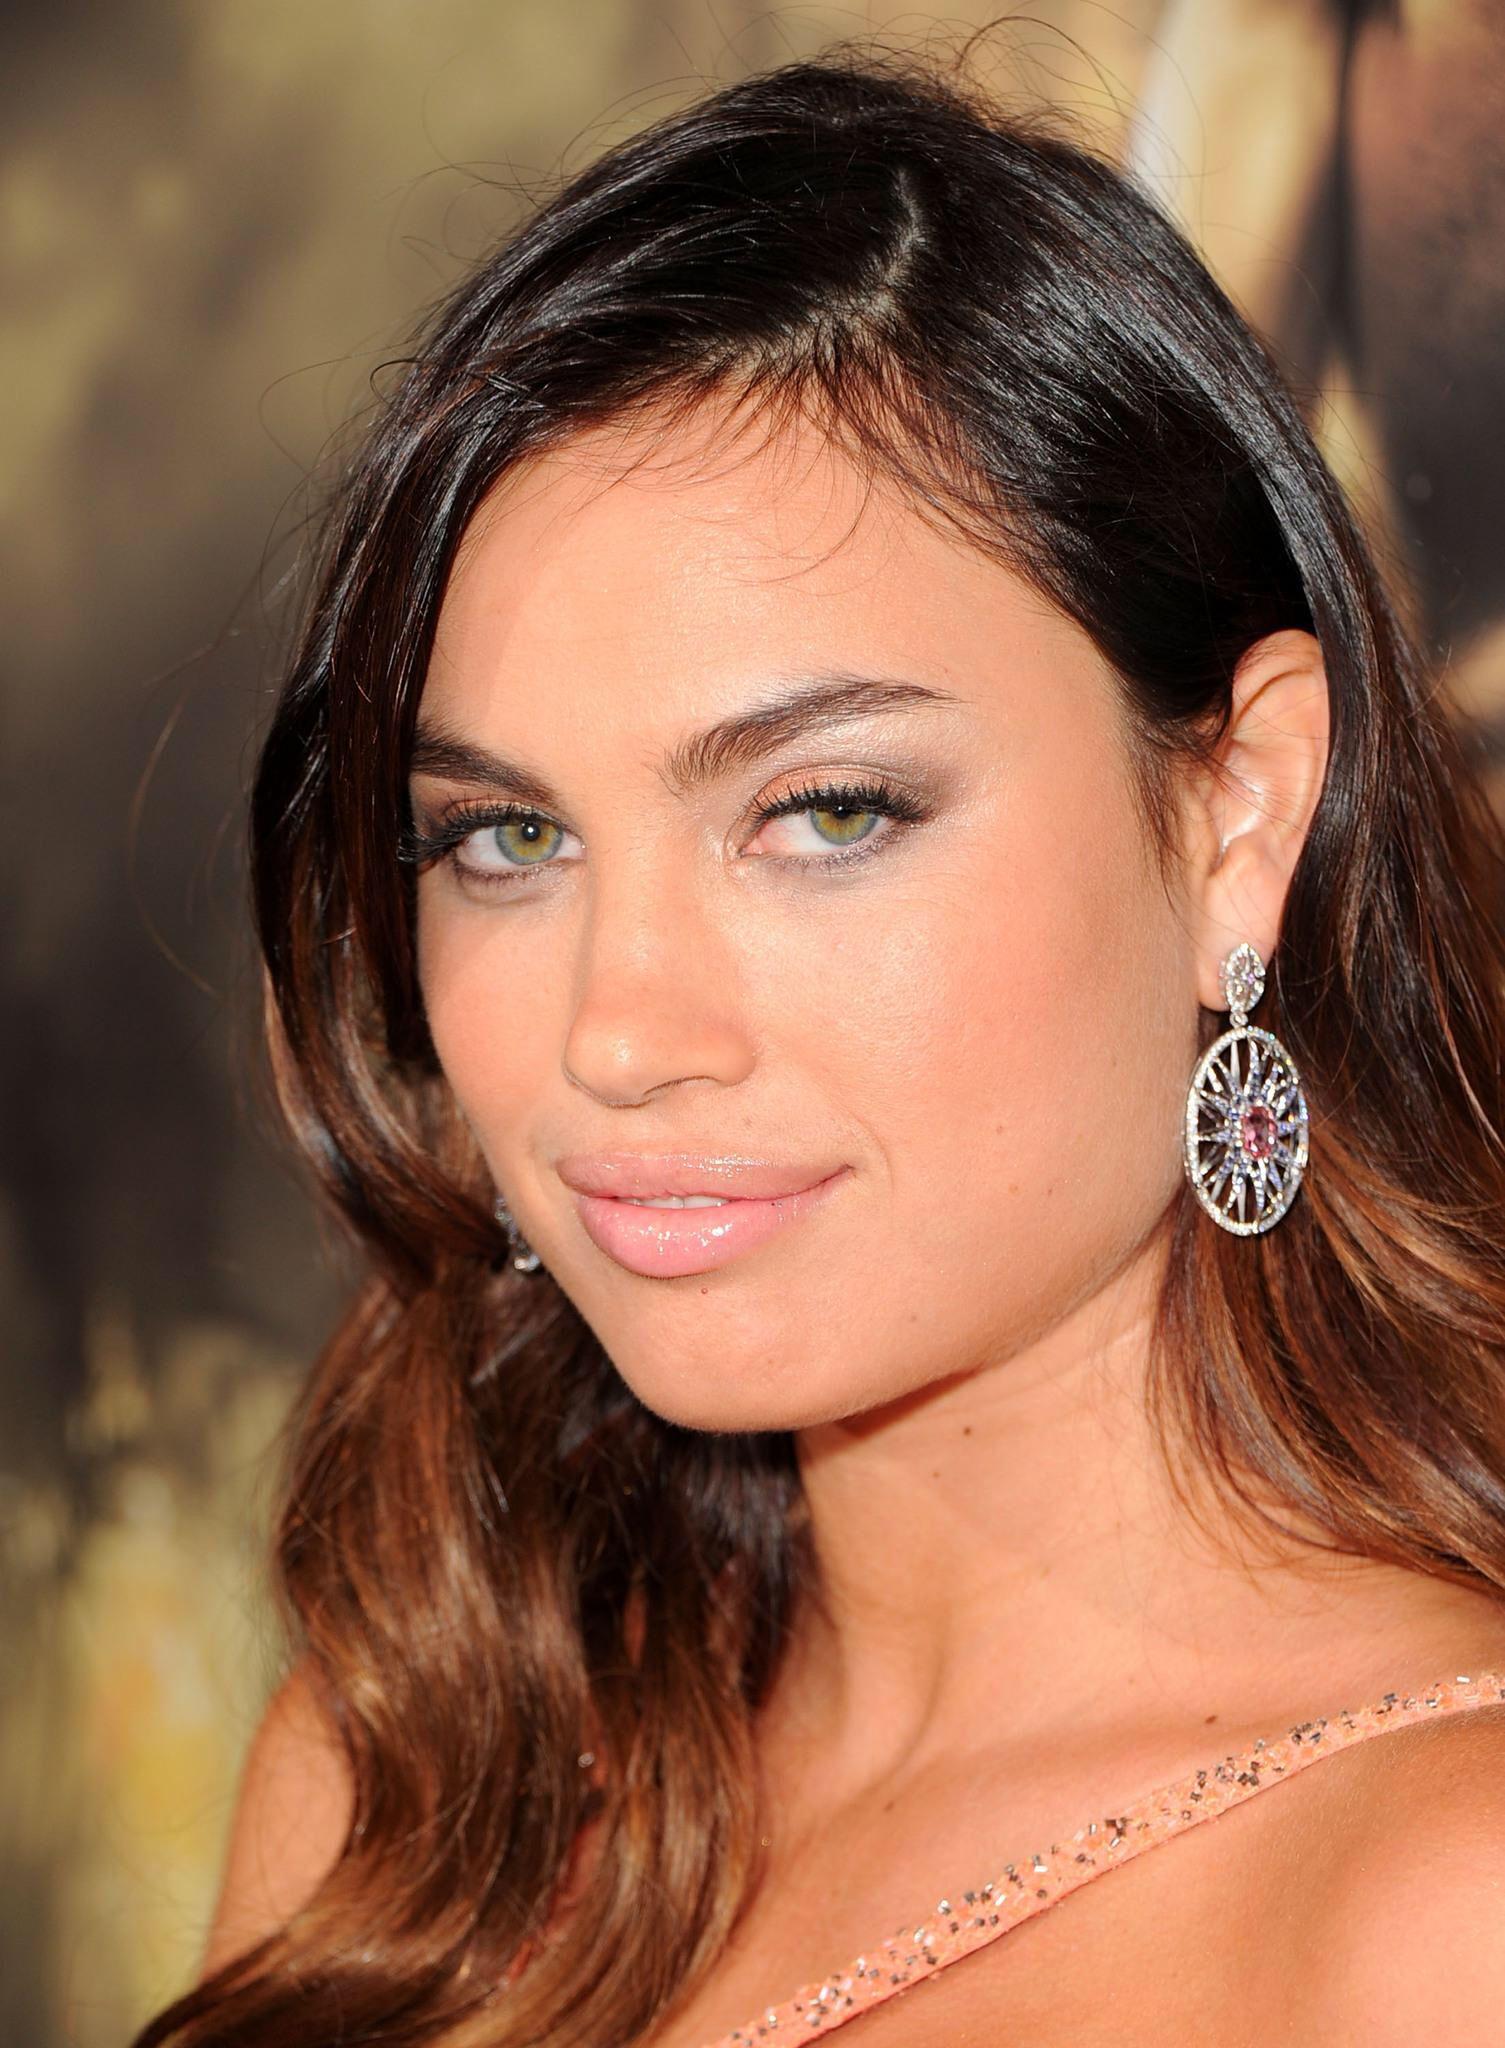 Alina Puscau | Hair & makeup | Diamond earrings, Jewelry ...